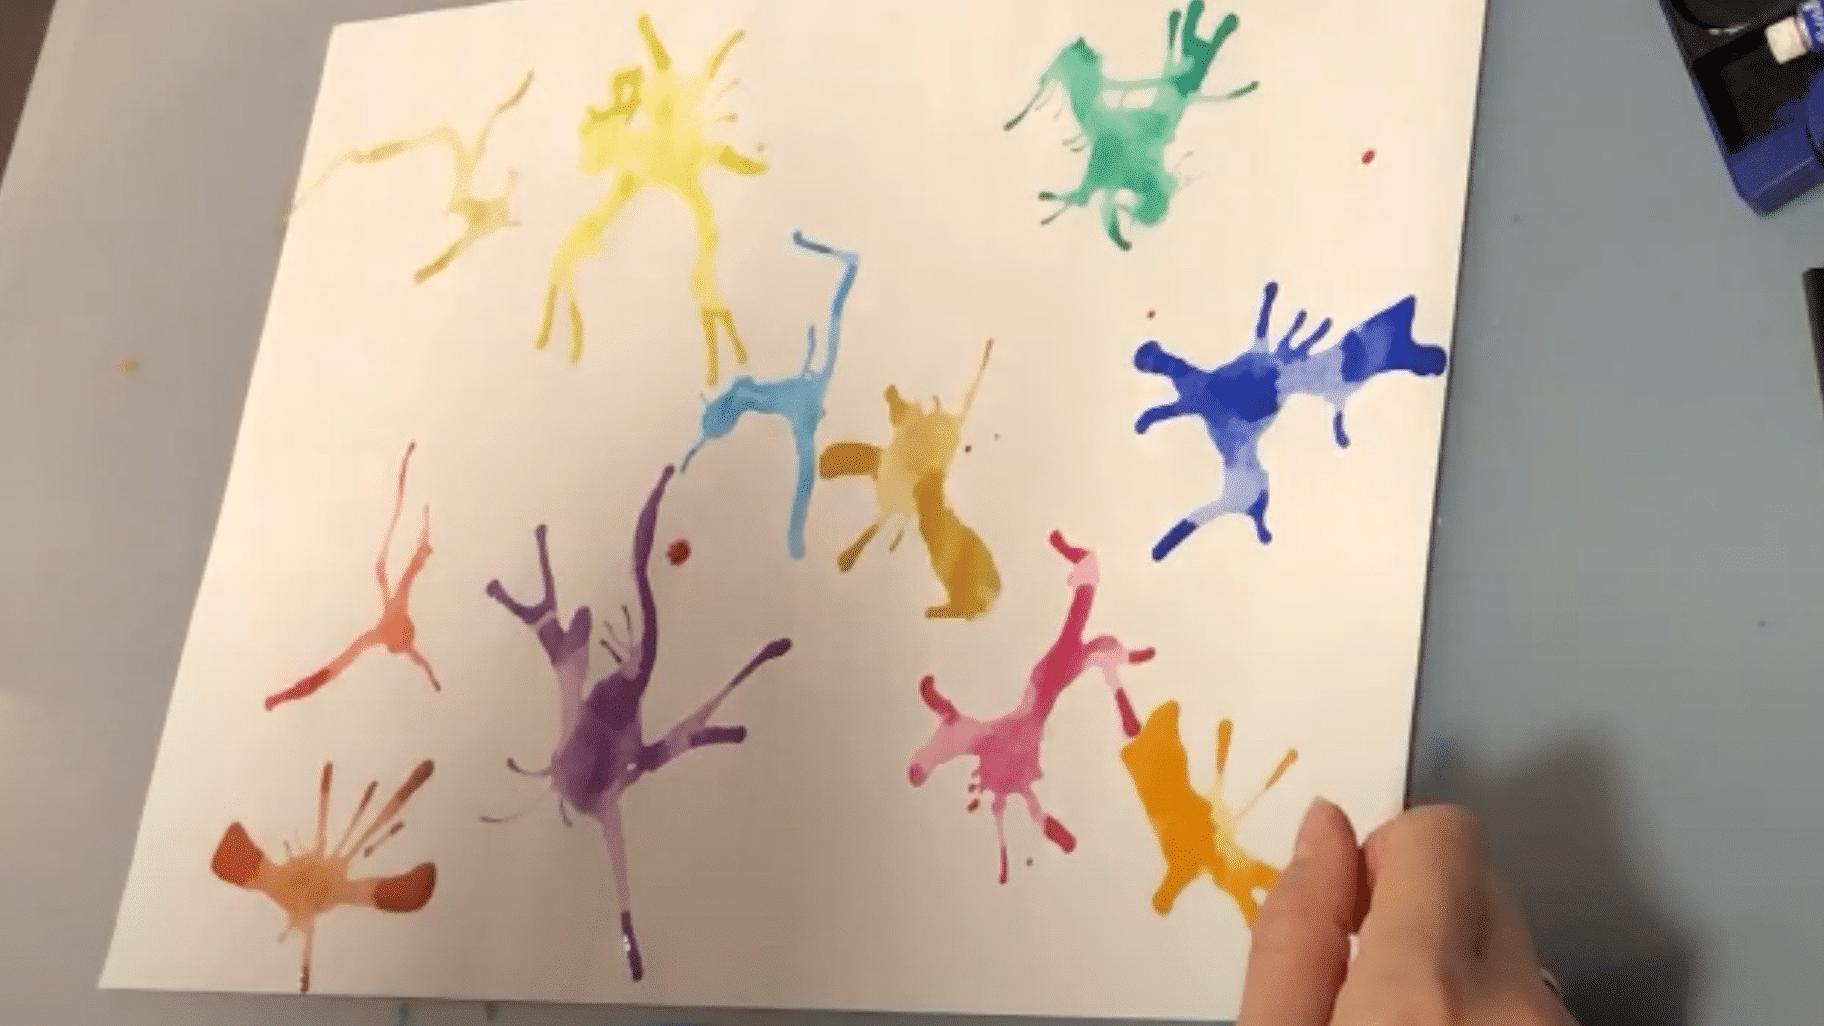 Kunst - Farbkleckse - Schritt 3 (02)